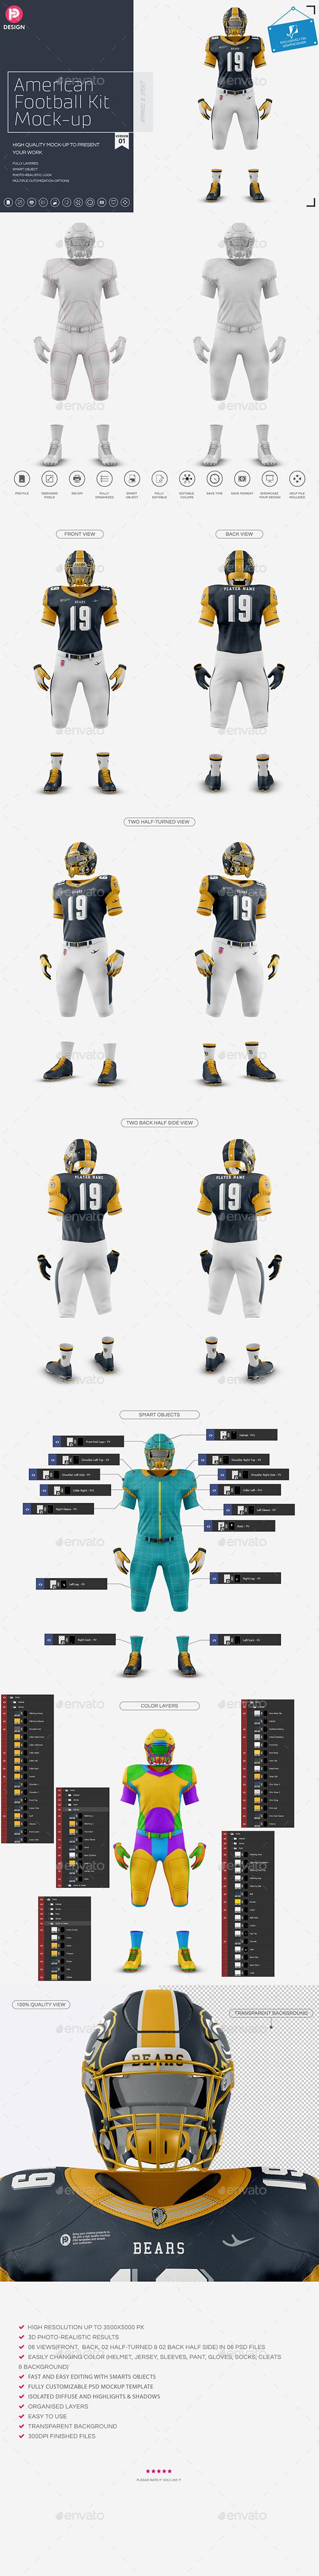 Download American Football Kit Mockup V1 By Trdesignme Graphicriver Free Mockups